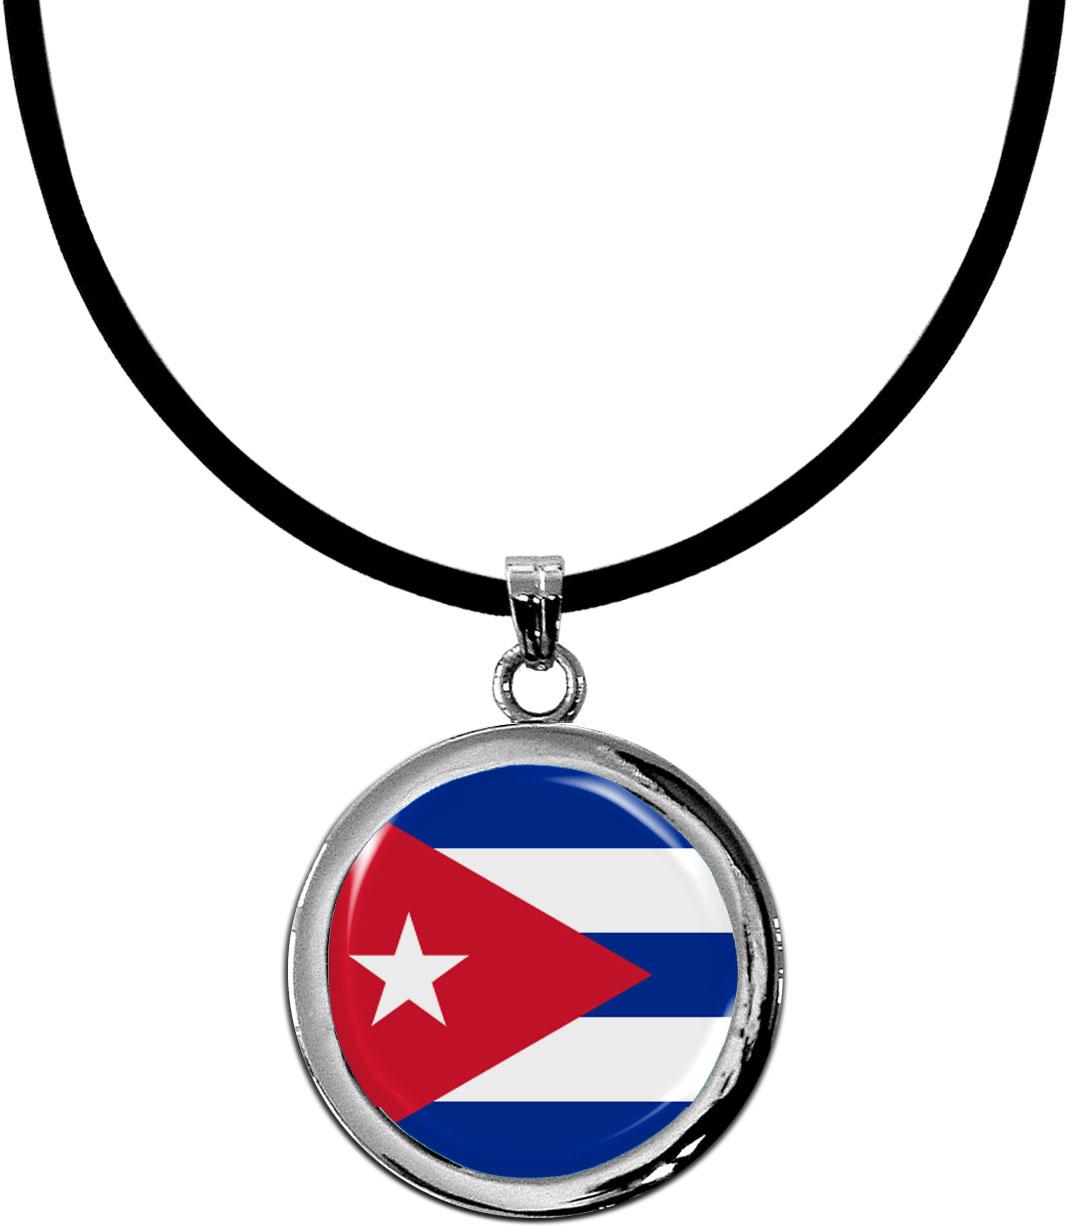 Kettenanhänger / Kuba / Silikonband mit Silberverschluss